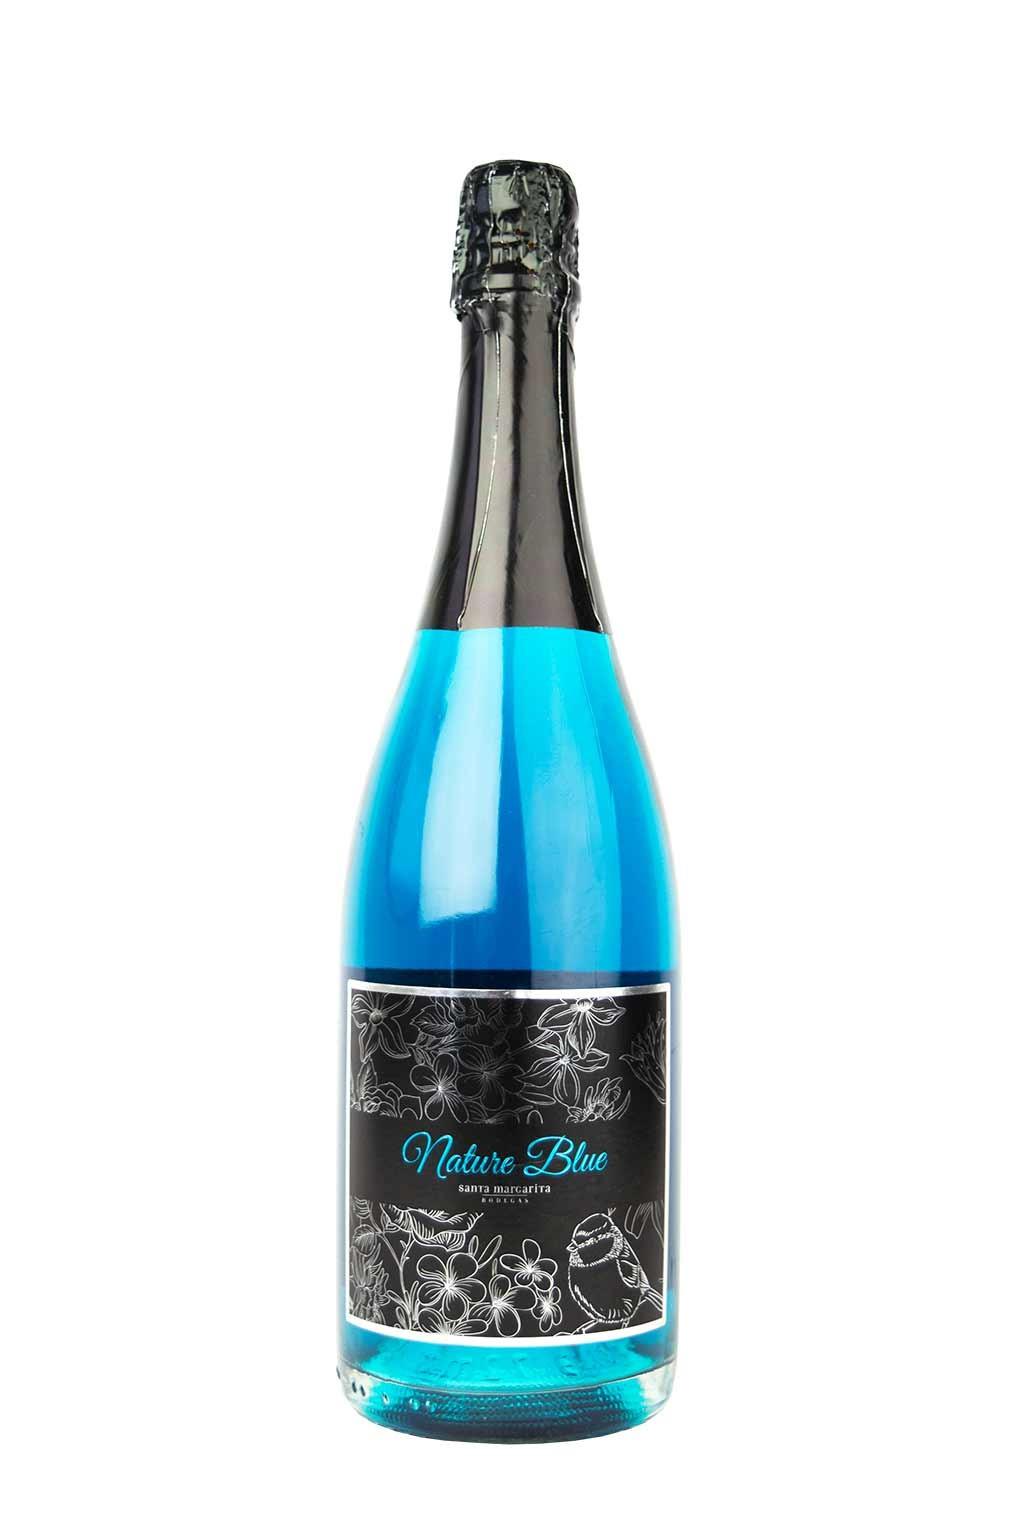 vino azul qu son los vinos azules el vino blasfemo